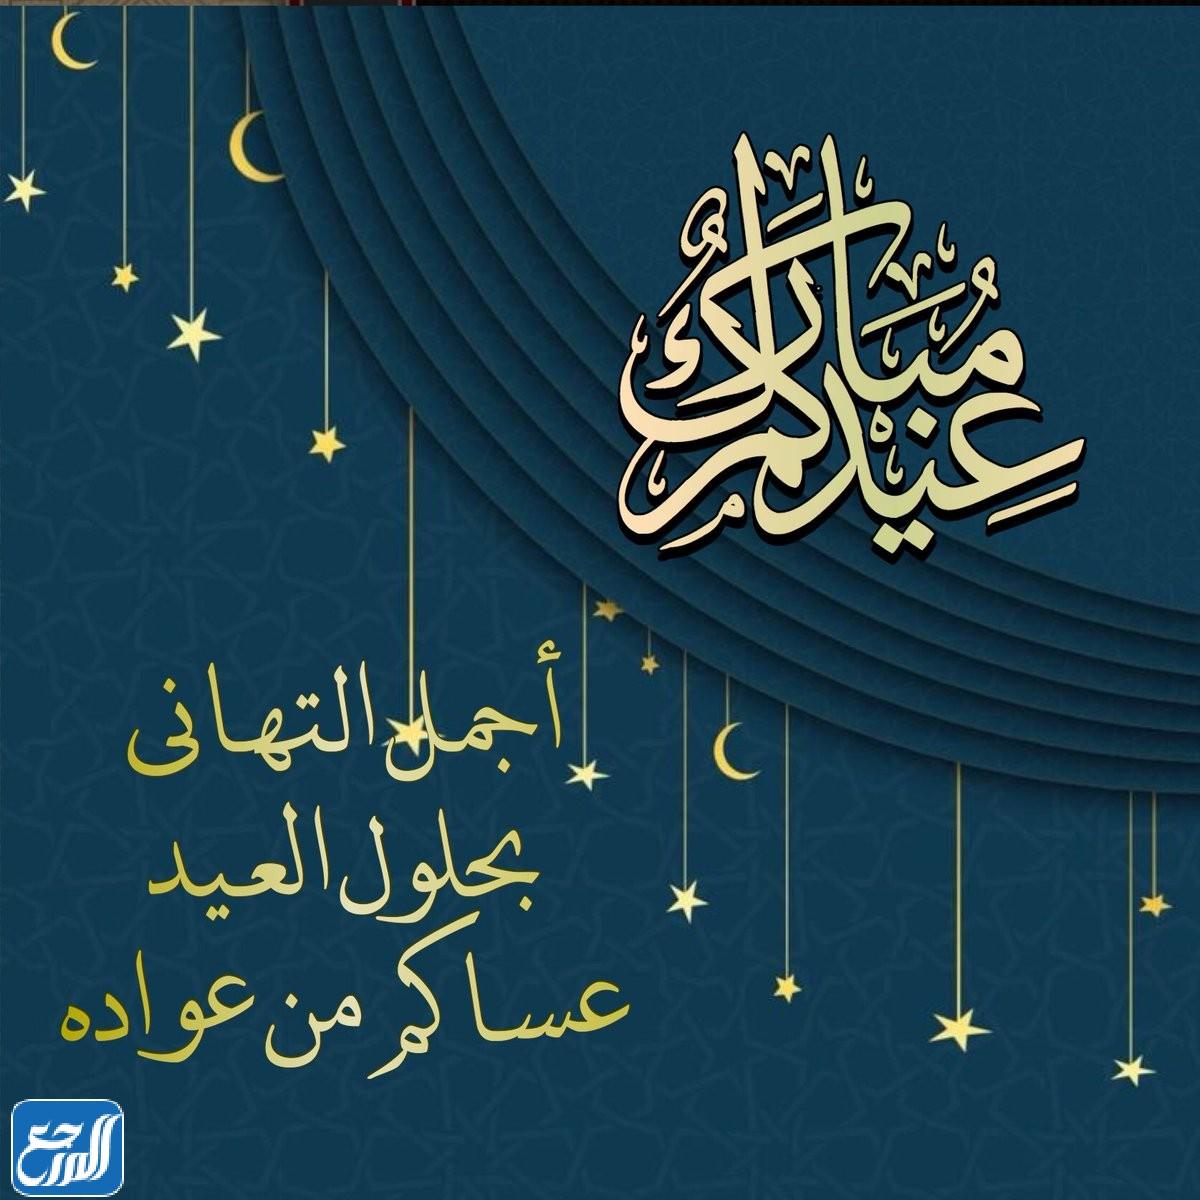 رمزيات عيدكم مبارك وعساكم من عواده3 (1)